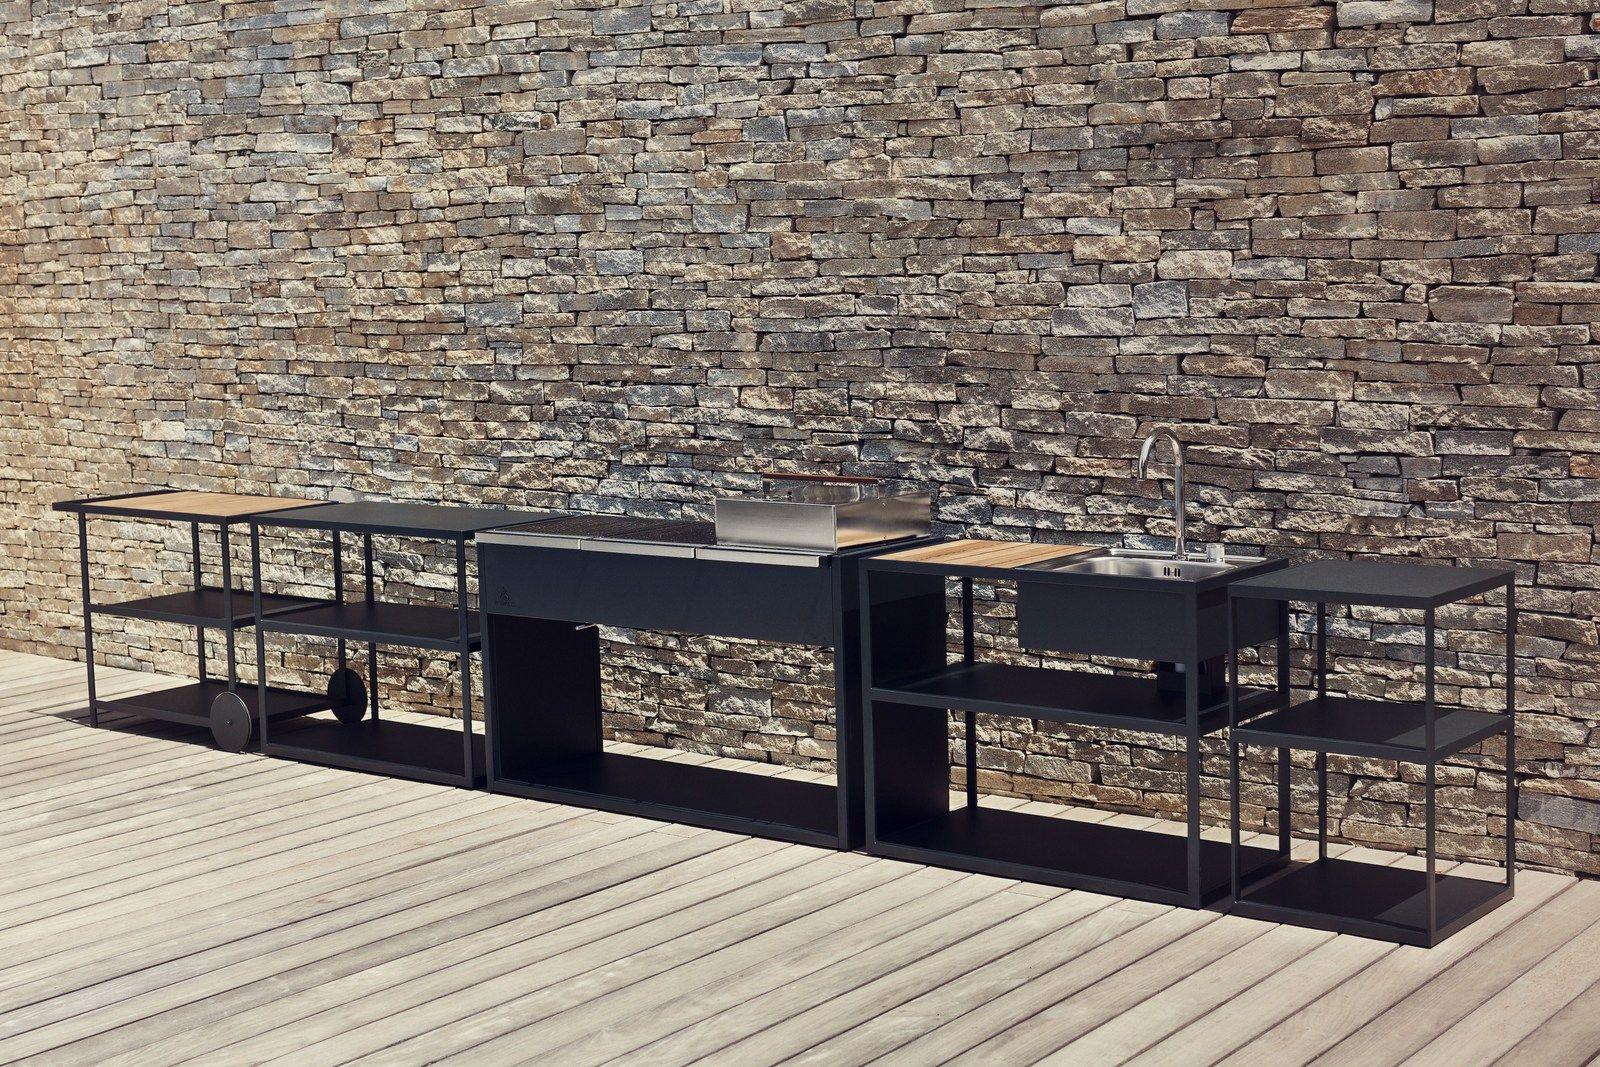 Outdoorküche Garten Edelstahl Günstig : Gartenküche und outdoorküche grillen im garten